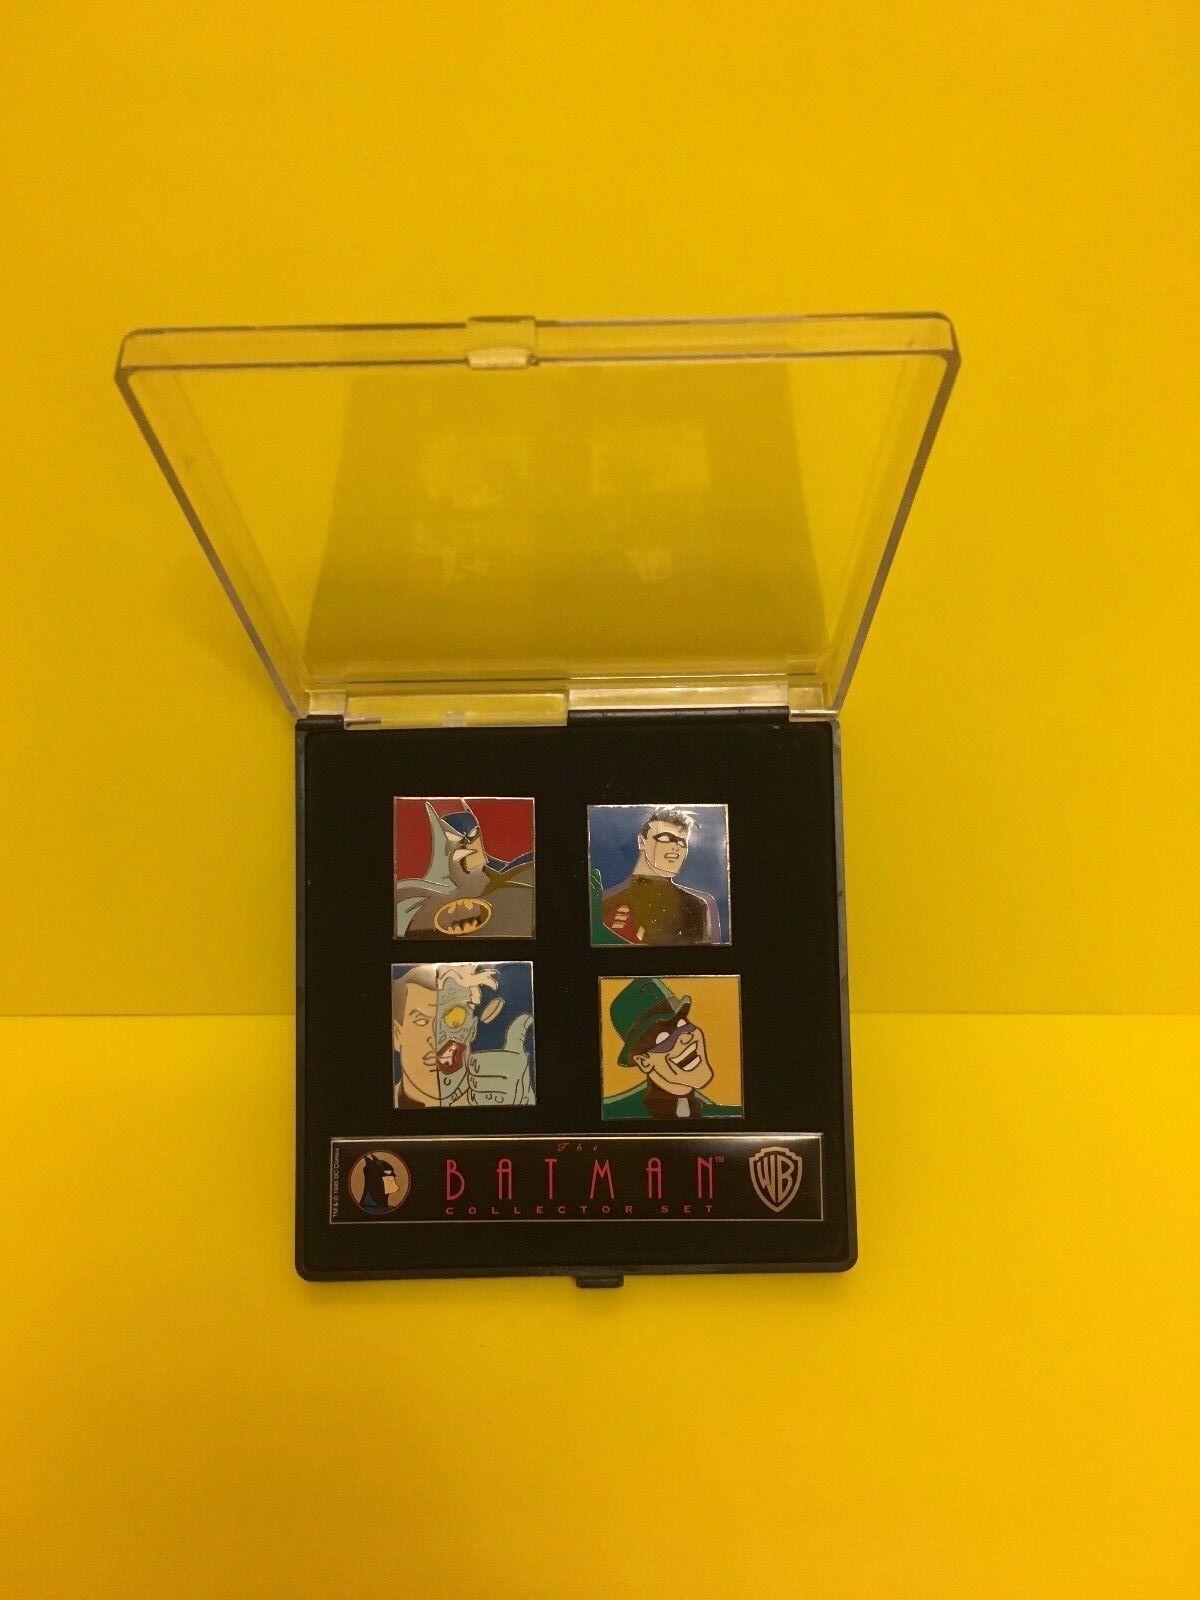 Der batman - sammlung - marke dc set - warner brothers dc marke comics, 1995 c94cae